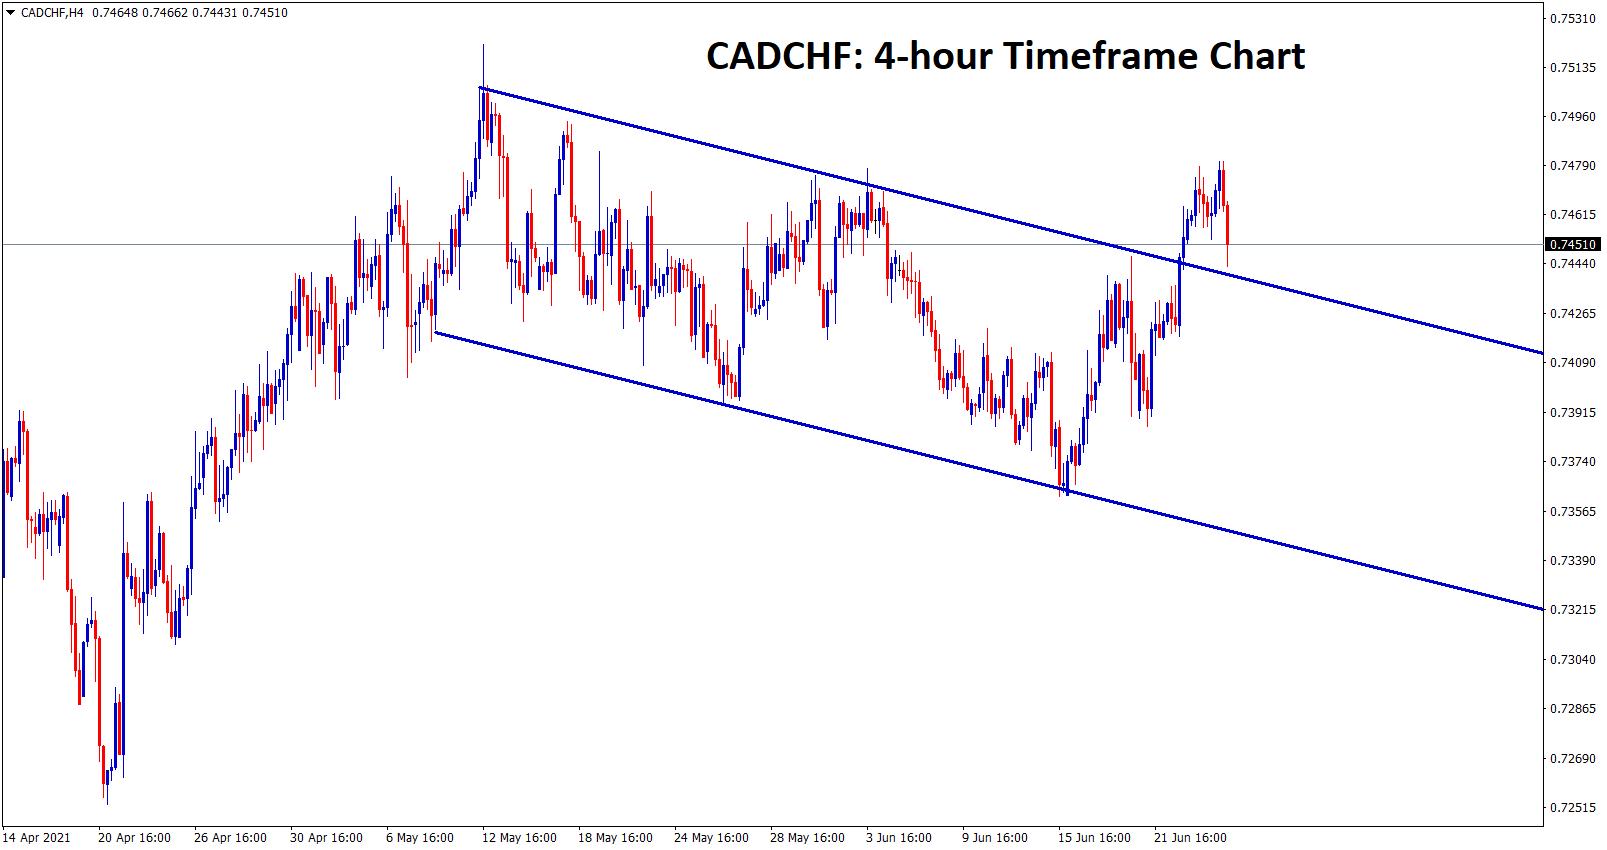 Descending channel market breakout in cadchf h4 chart